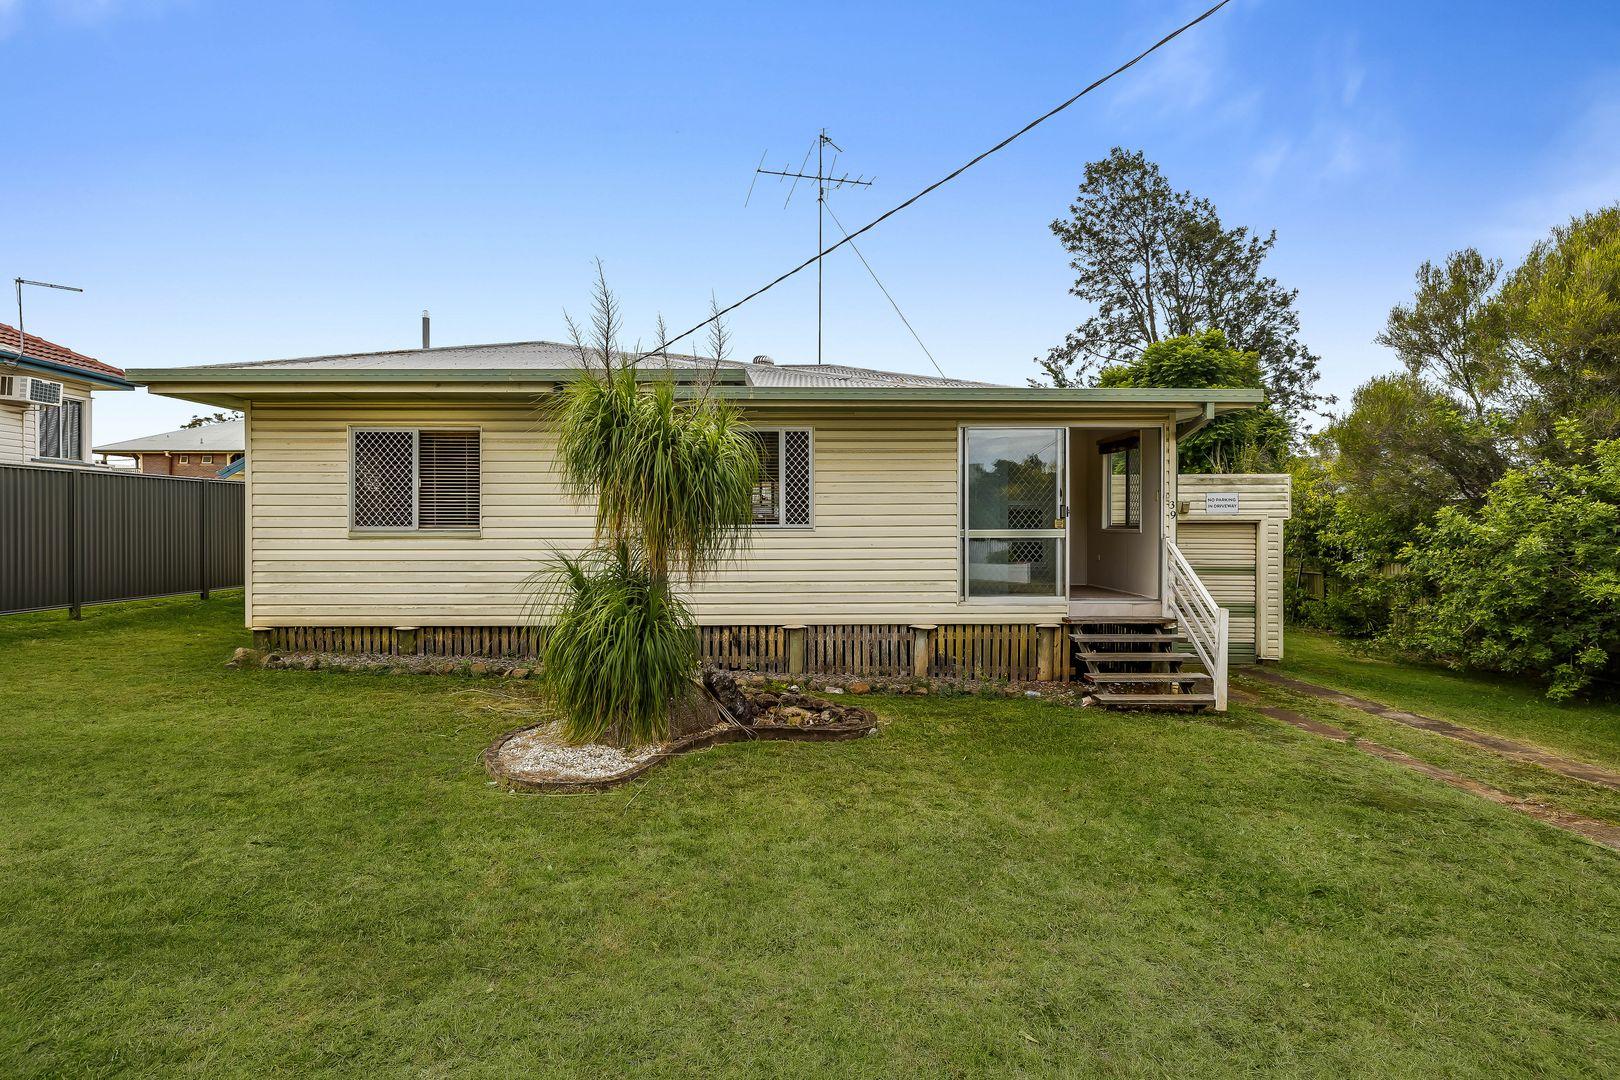 39 Joyce Street, South Toowoomba QLD 4350, Image 0